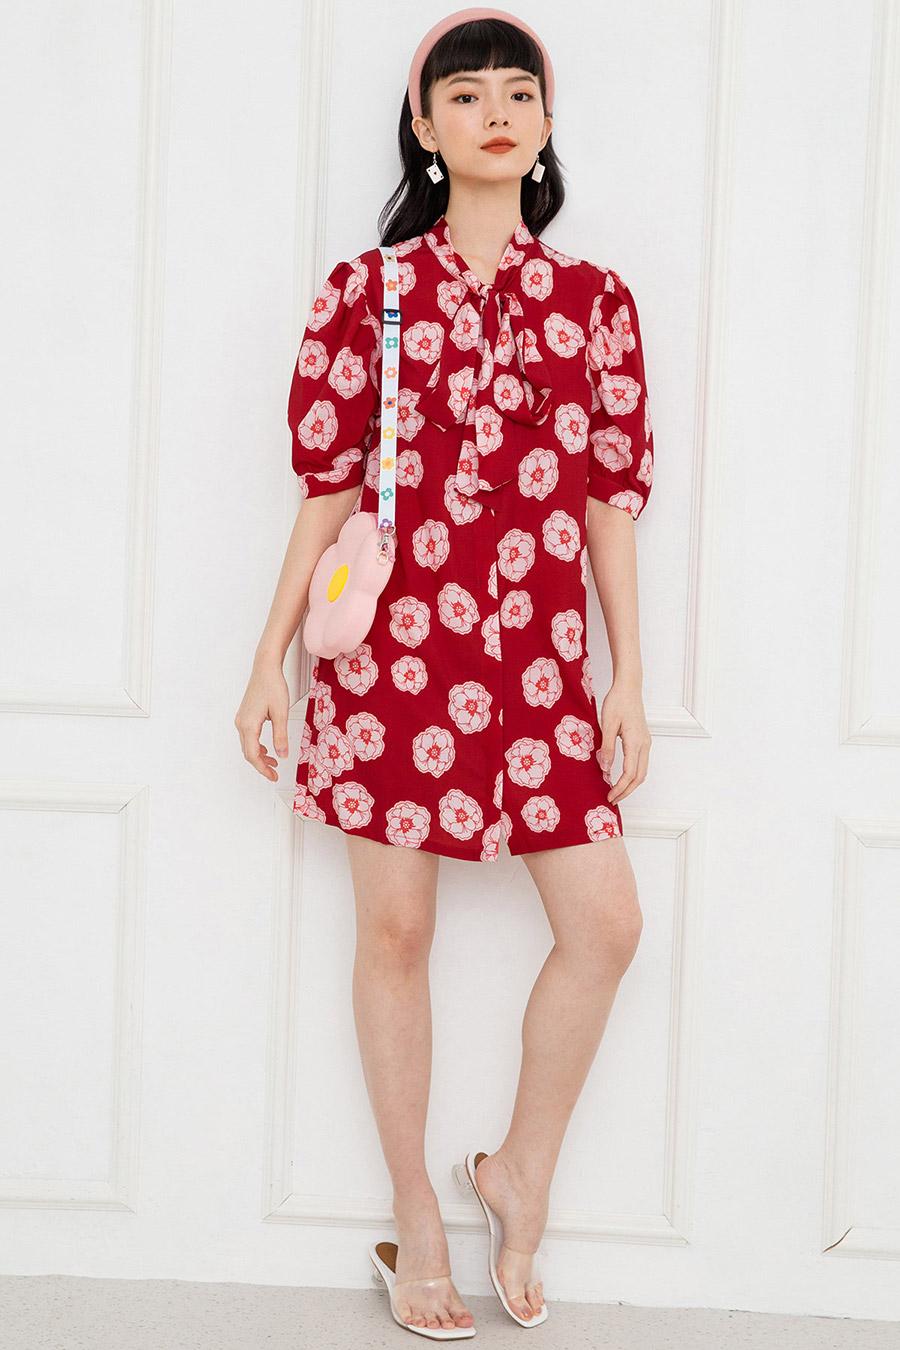 BONNARY DRESS - SCARLET FLEUR